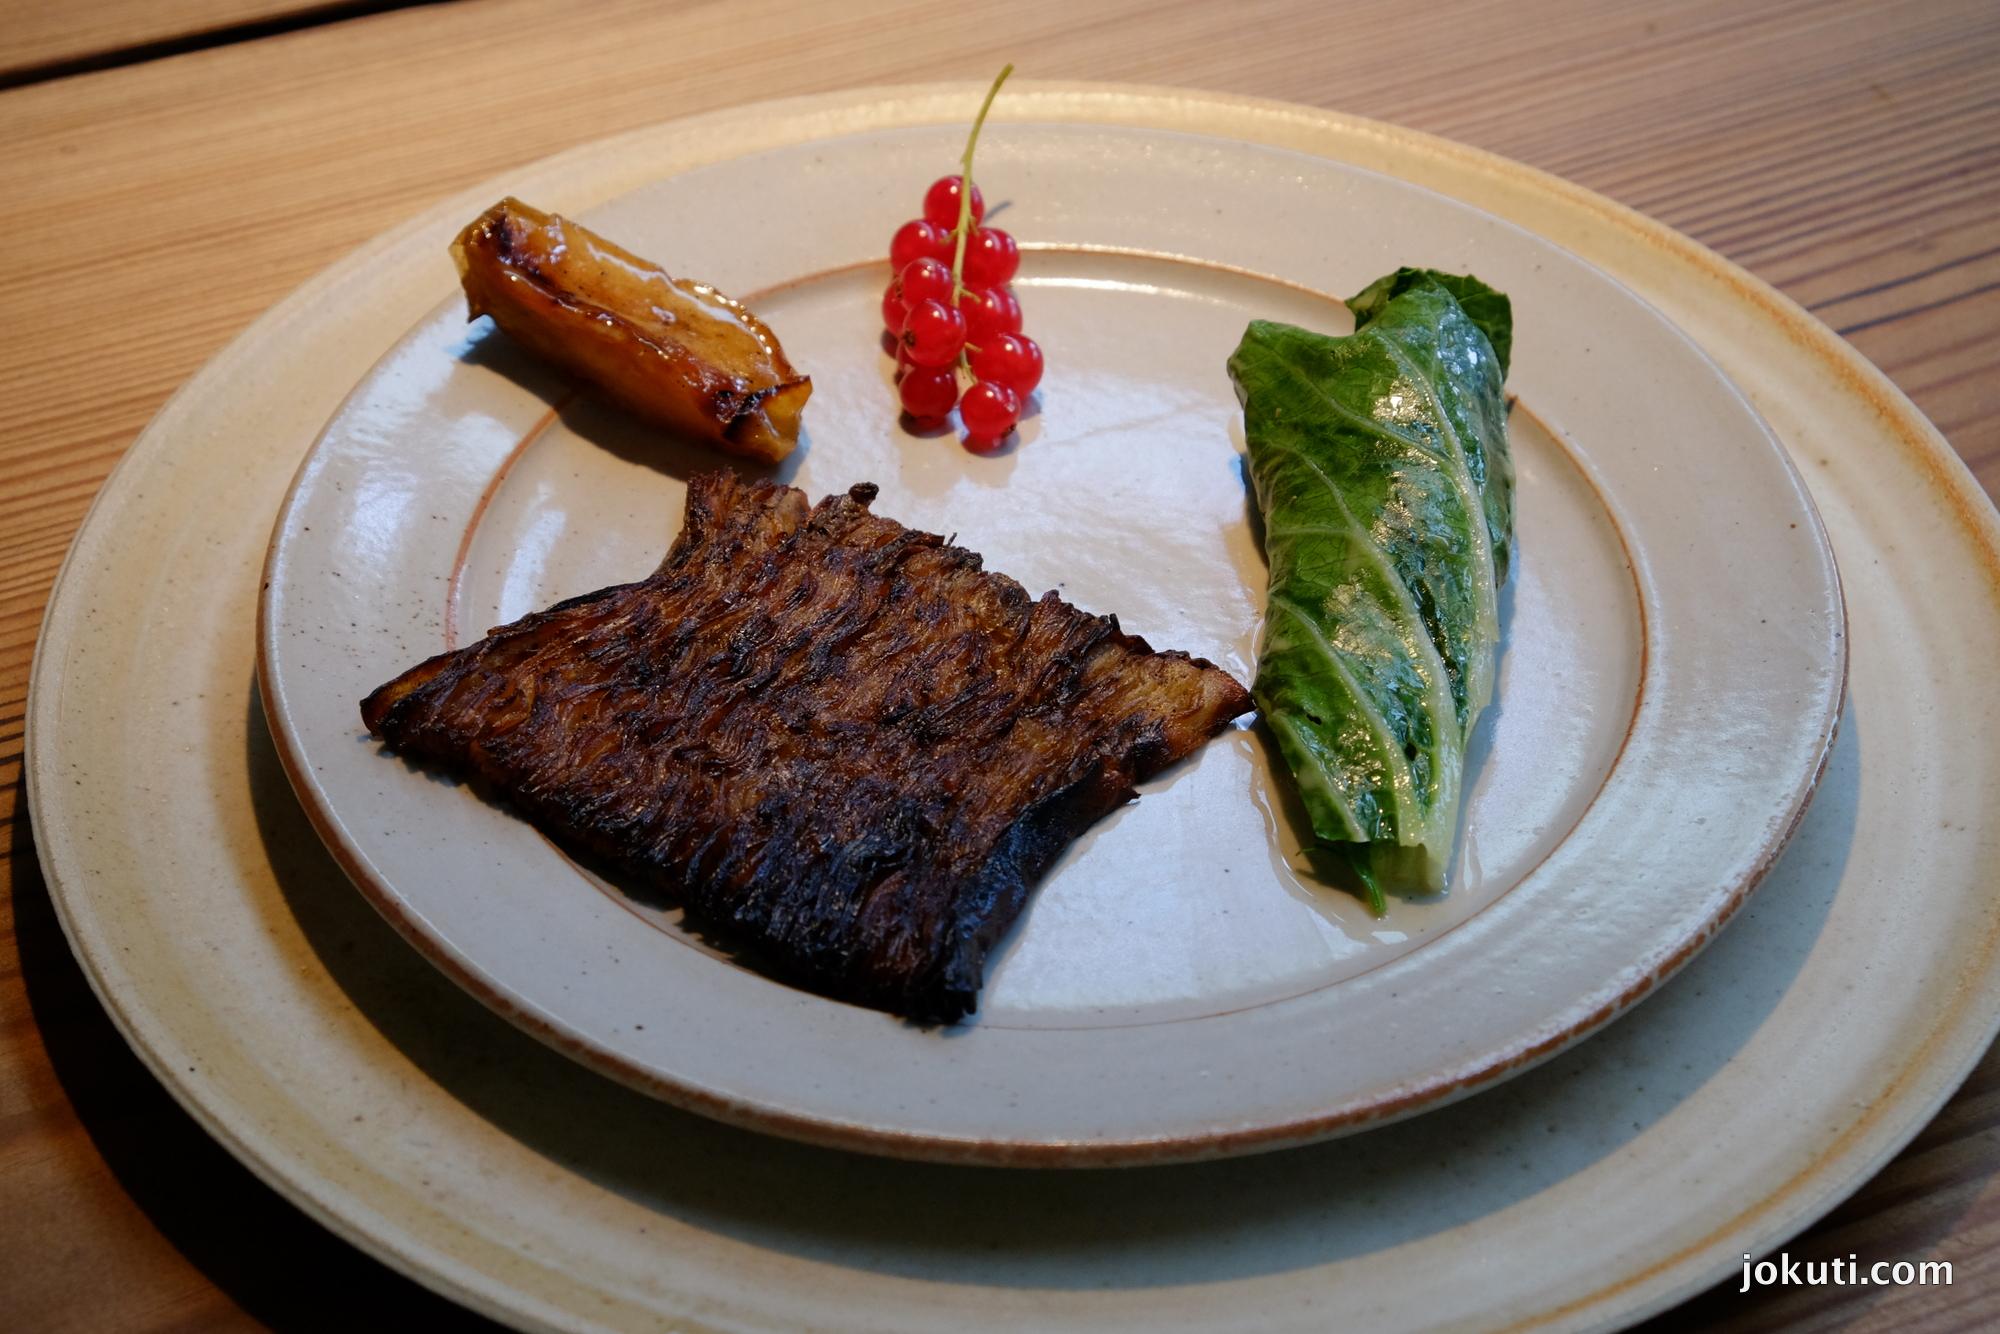 dscf0052_noma_copenhagen_redzepi_vegetables_plant_kingdom_kobenhavn_nordic_fine_dining_vilagevo_jokuti.jpg